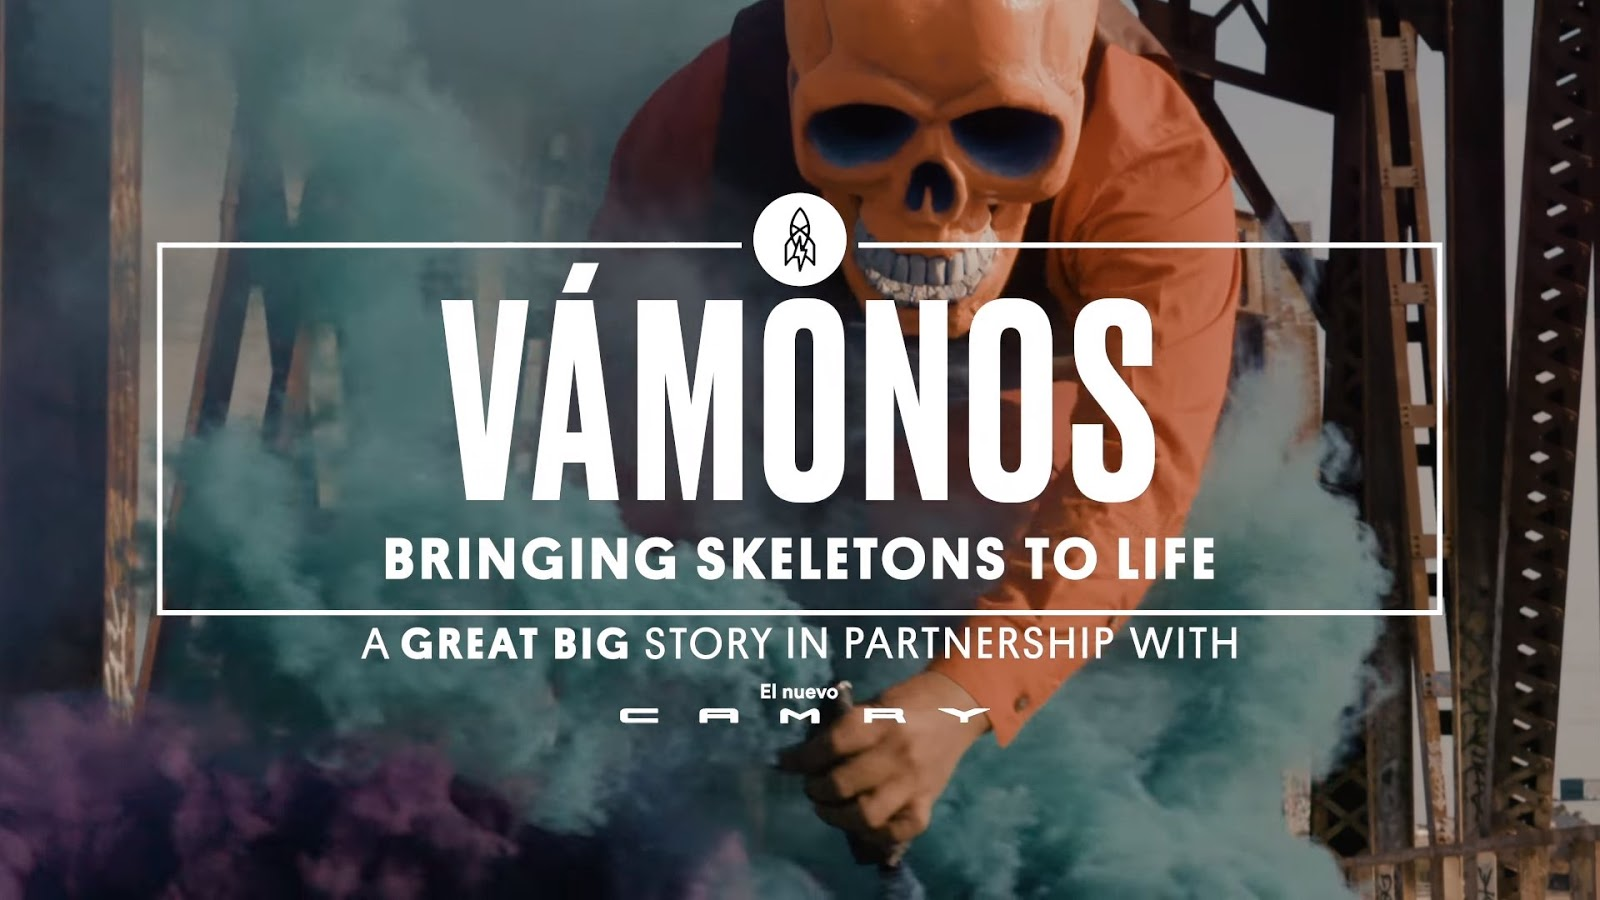 The Artist Bringing Vibrant Skeletons to Life